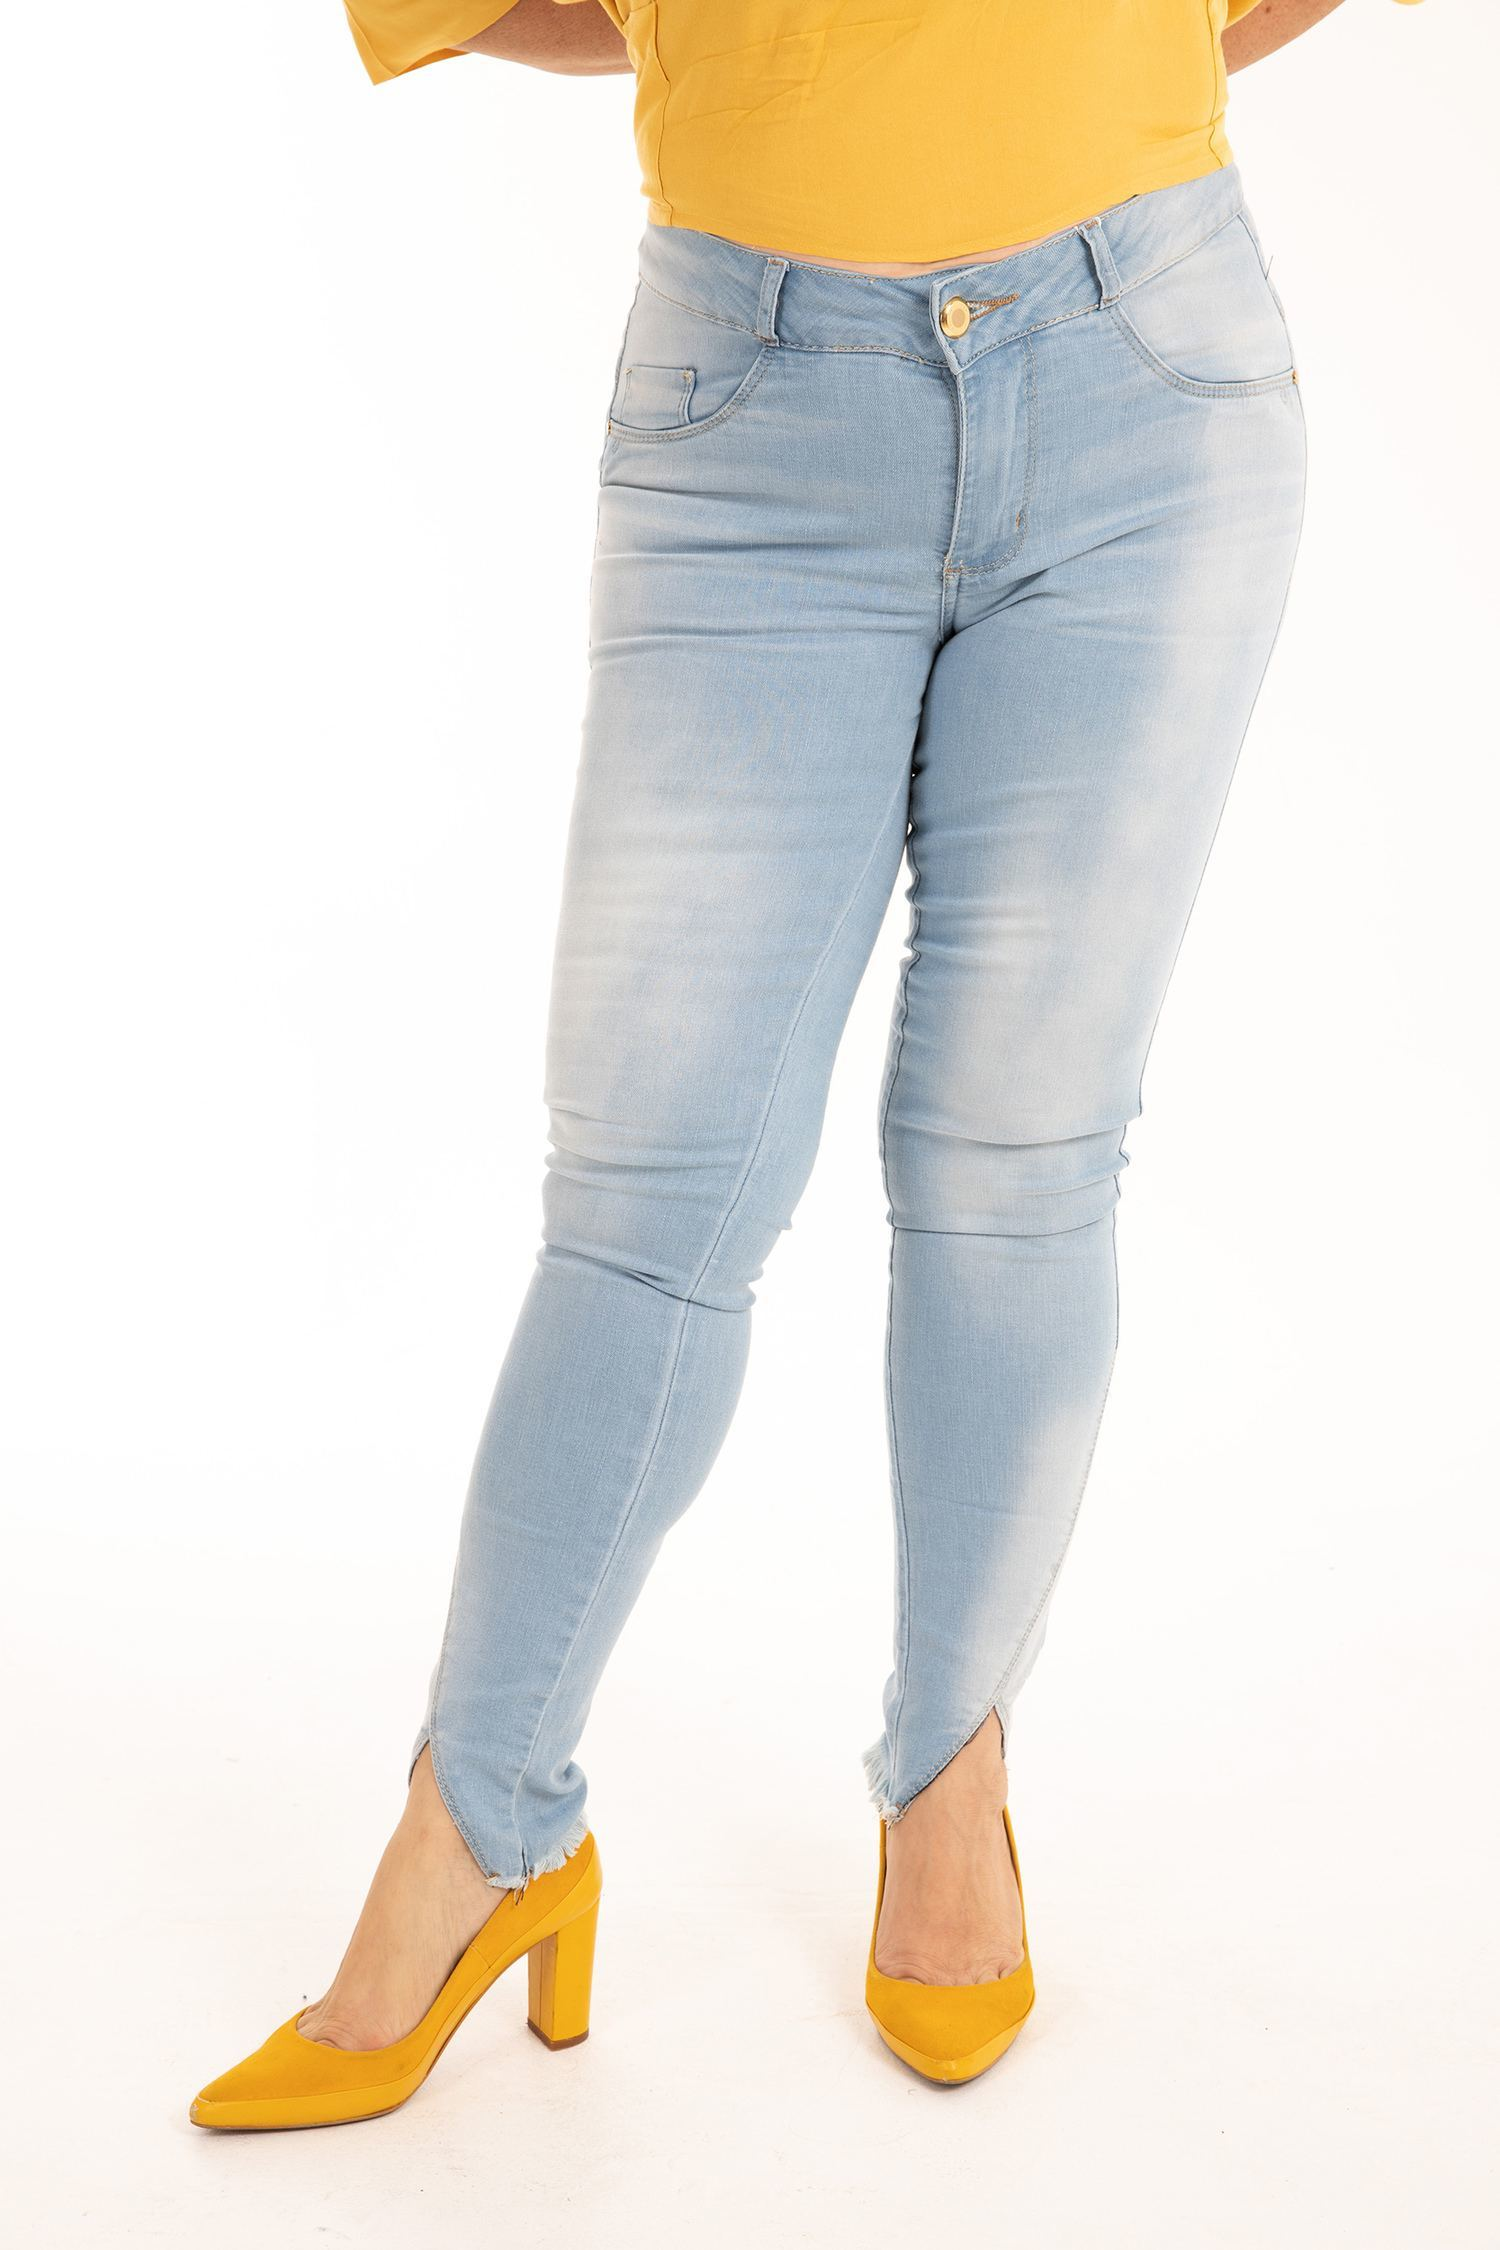 Calça Darlook Jeans Plus Size Becky ref. 38941 | Novidade